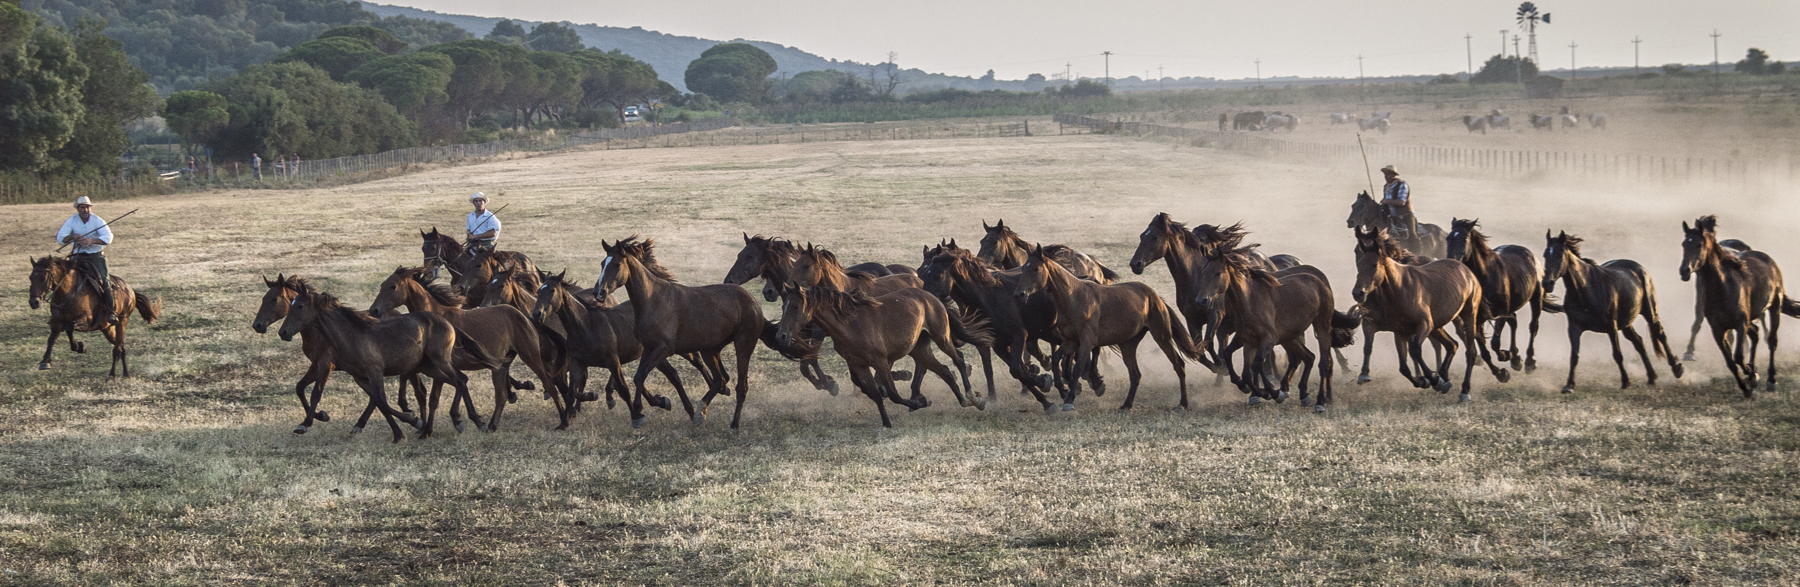 Gabrielle_Saveri_Italian Cowboys of Maremma_Butteri Herding Foals Through Large Meadow.jpeg